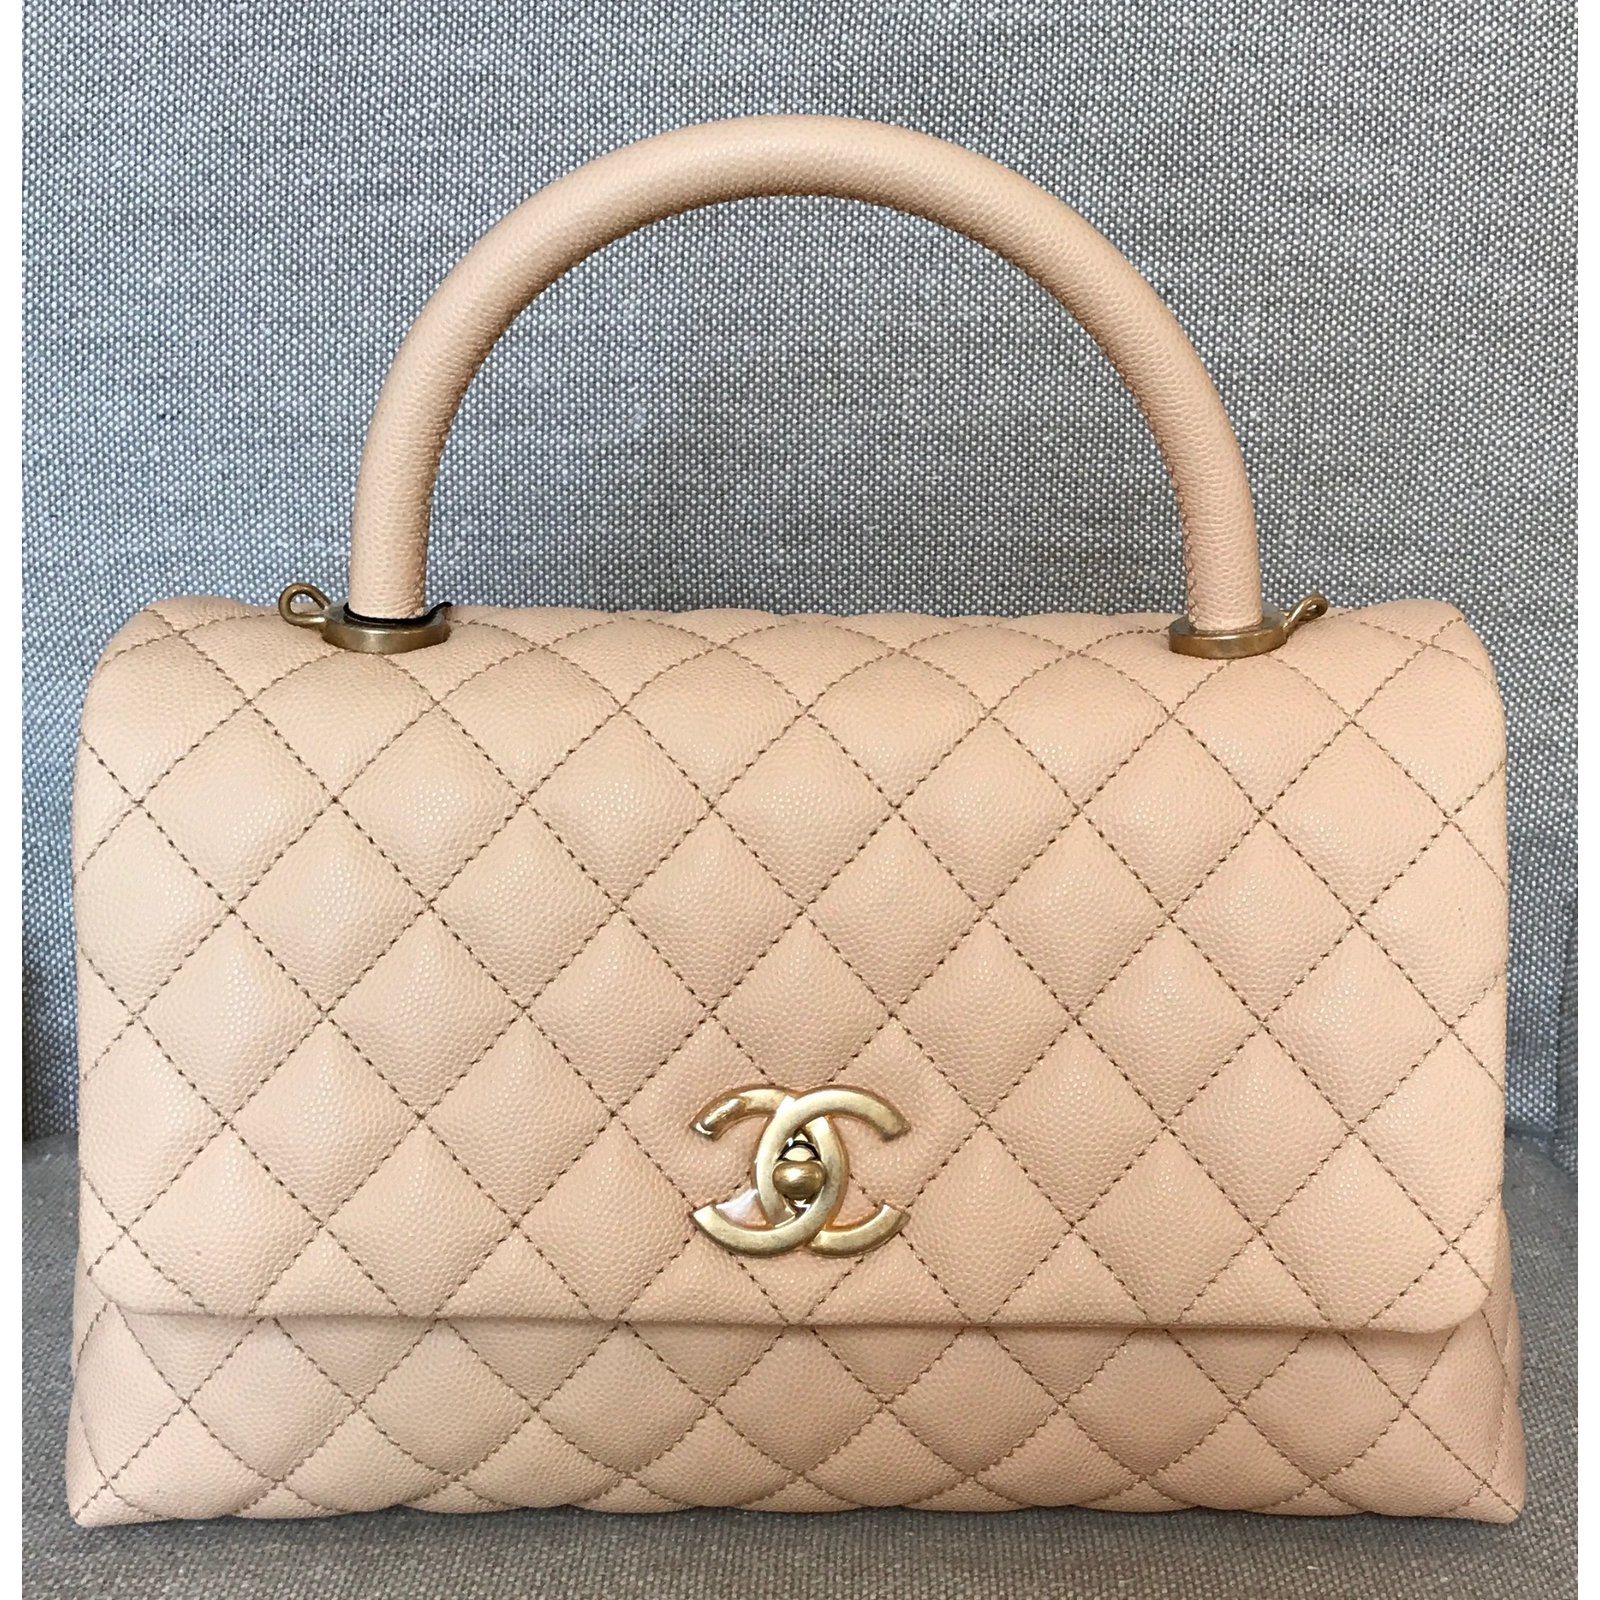 Chanel Handbag Cheap - HandBags 2018